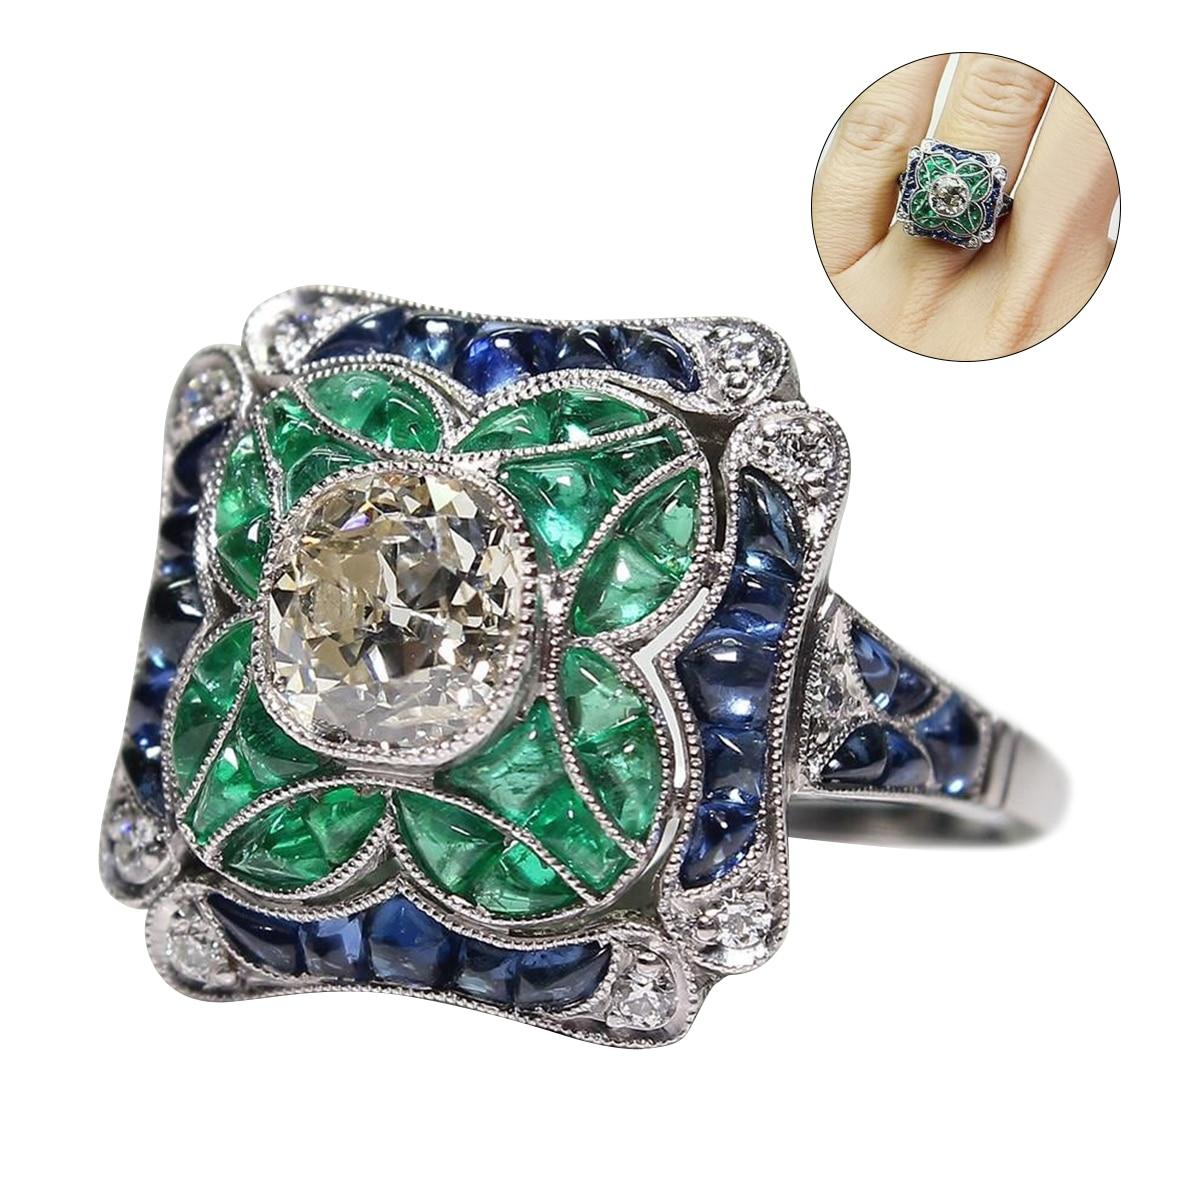 Vintage 925 Silver Emerald Zircon Ring Women Jewelry Anniversary Gift Sz6-10 MS